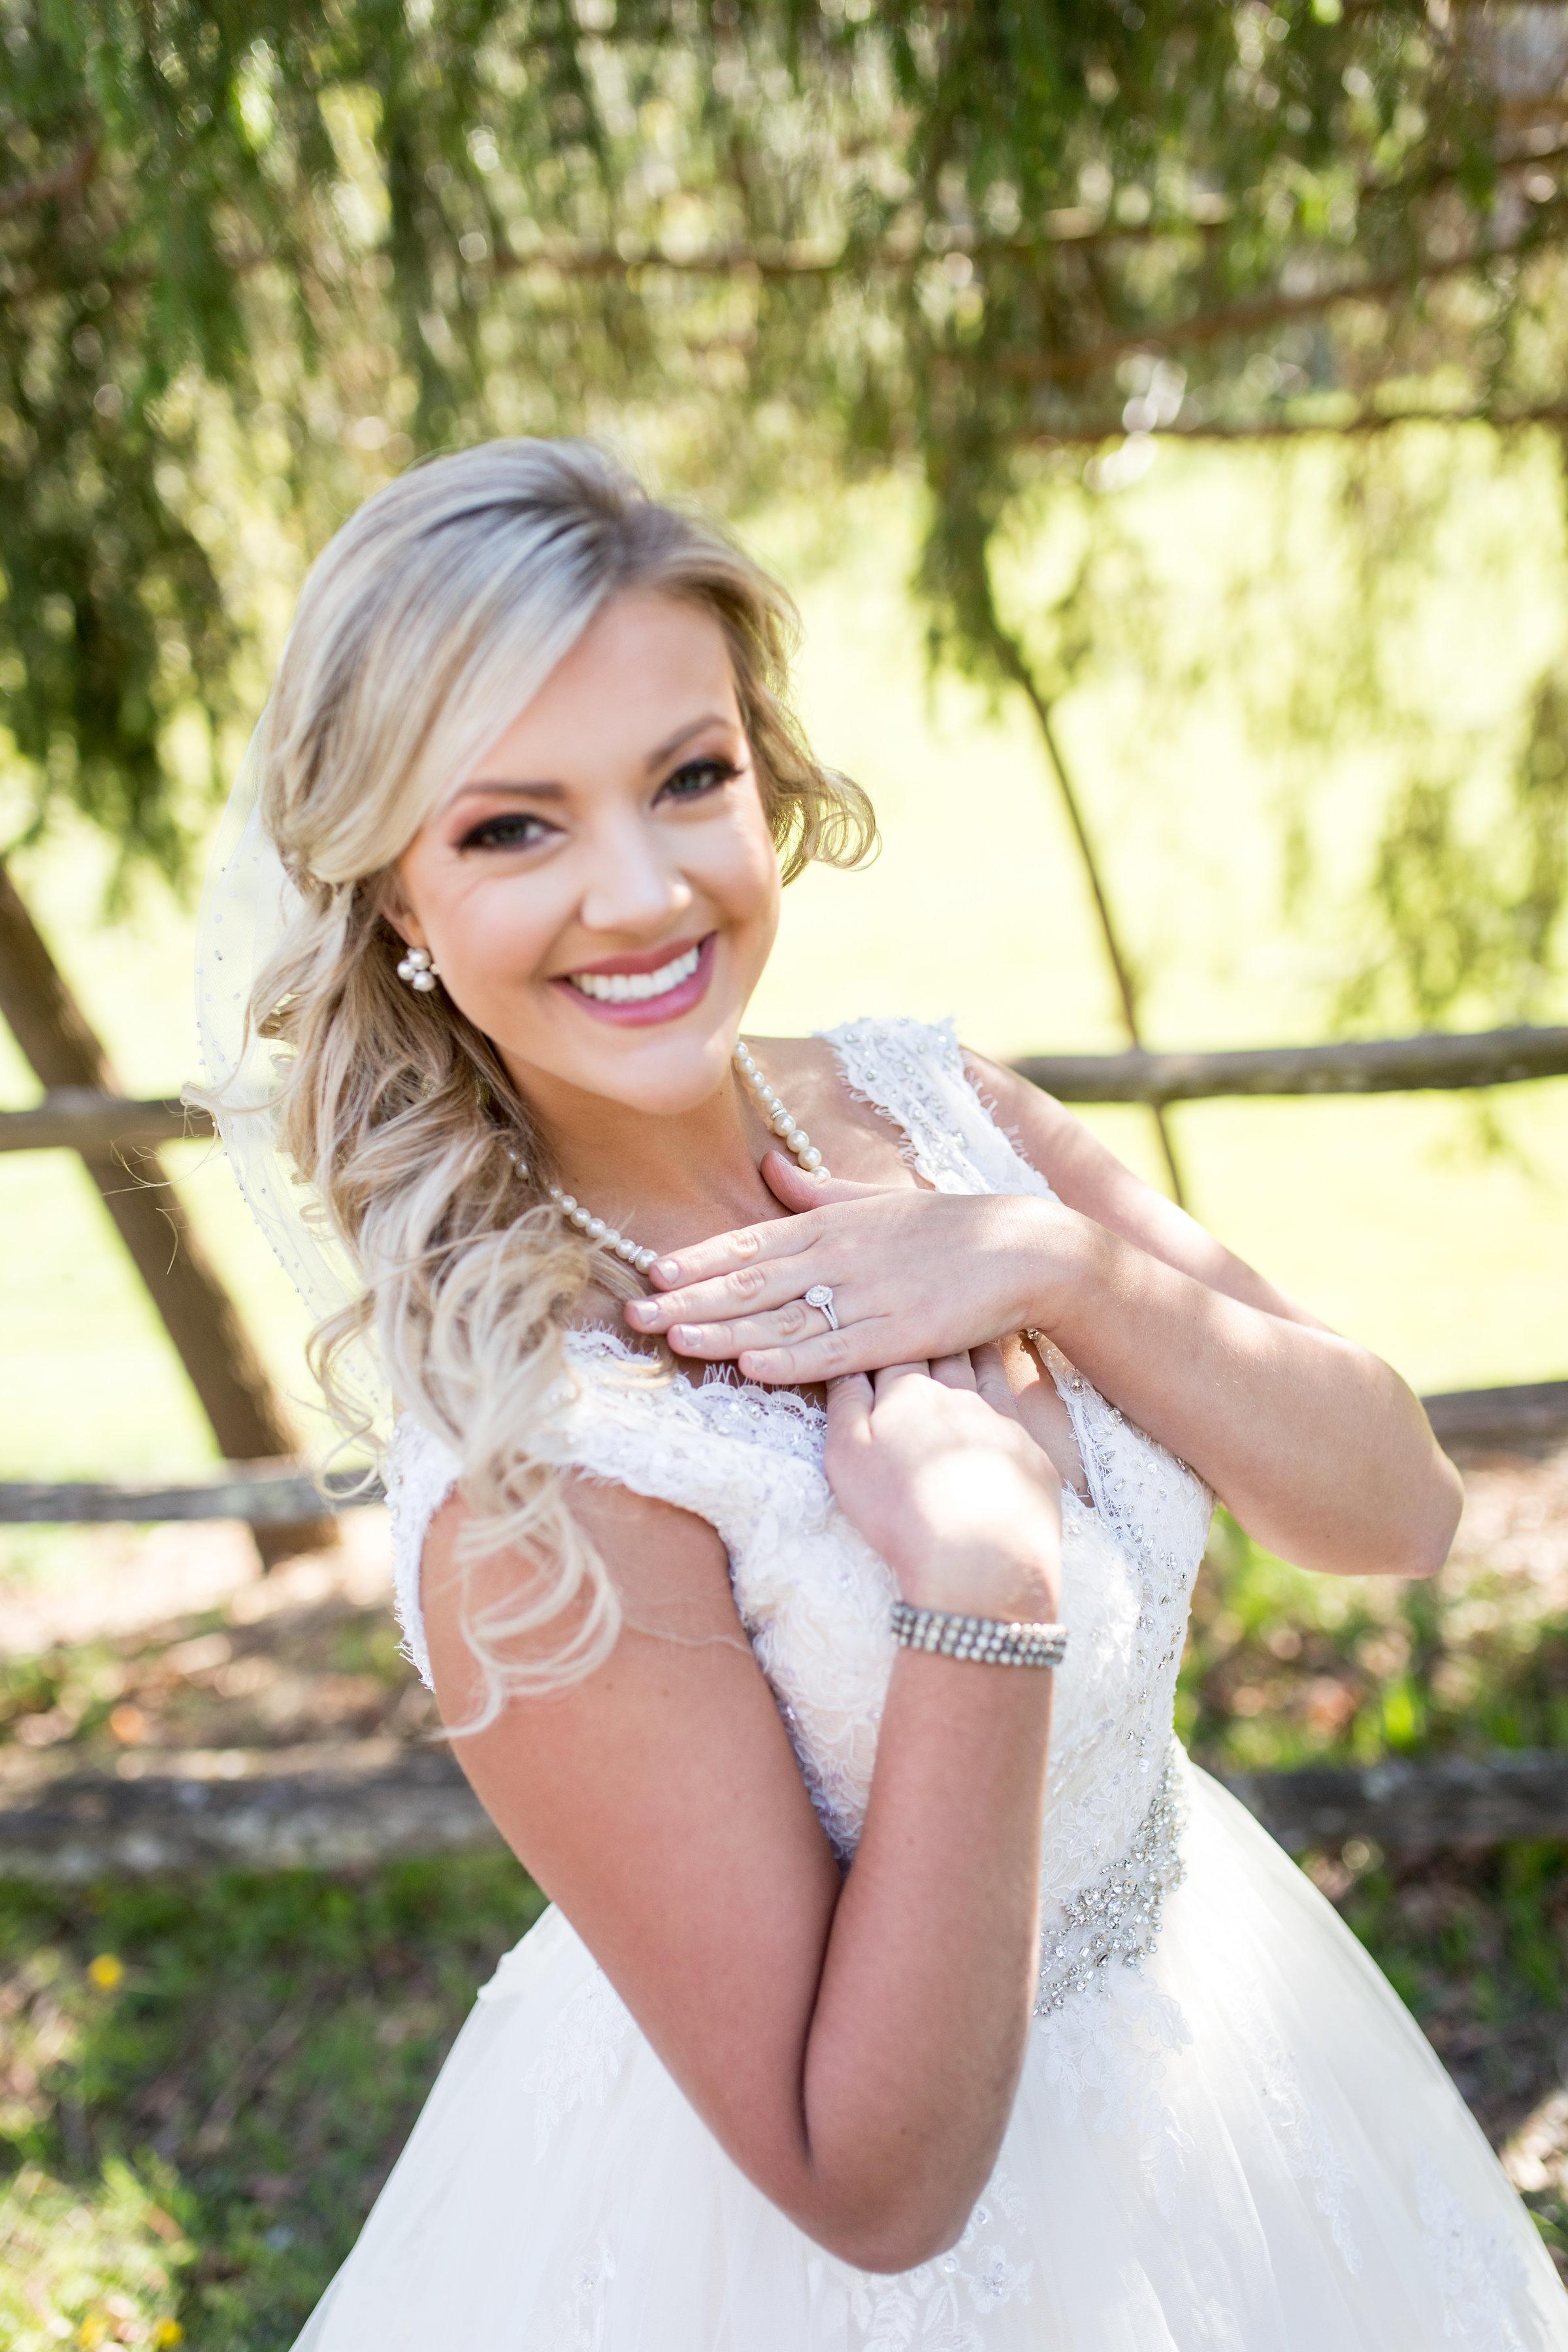 Honeysuckle-Hill-Asheville-Wedding-Venue-Ann-Cordell-Bridal-66.JPG